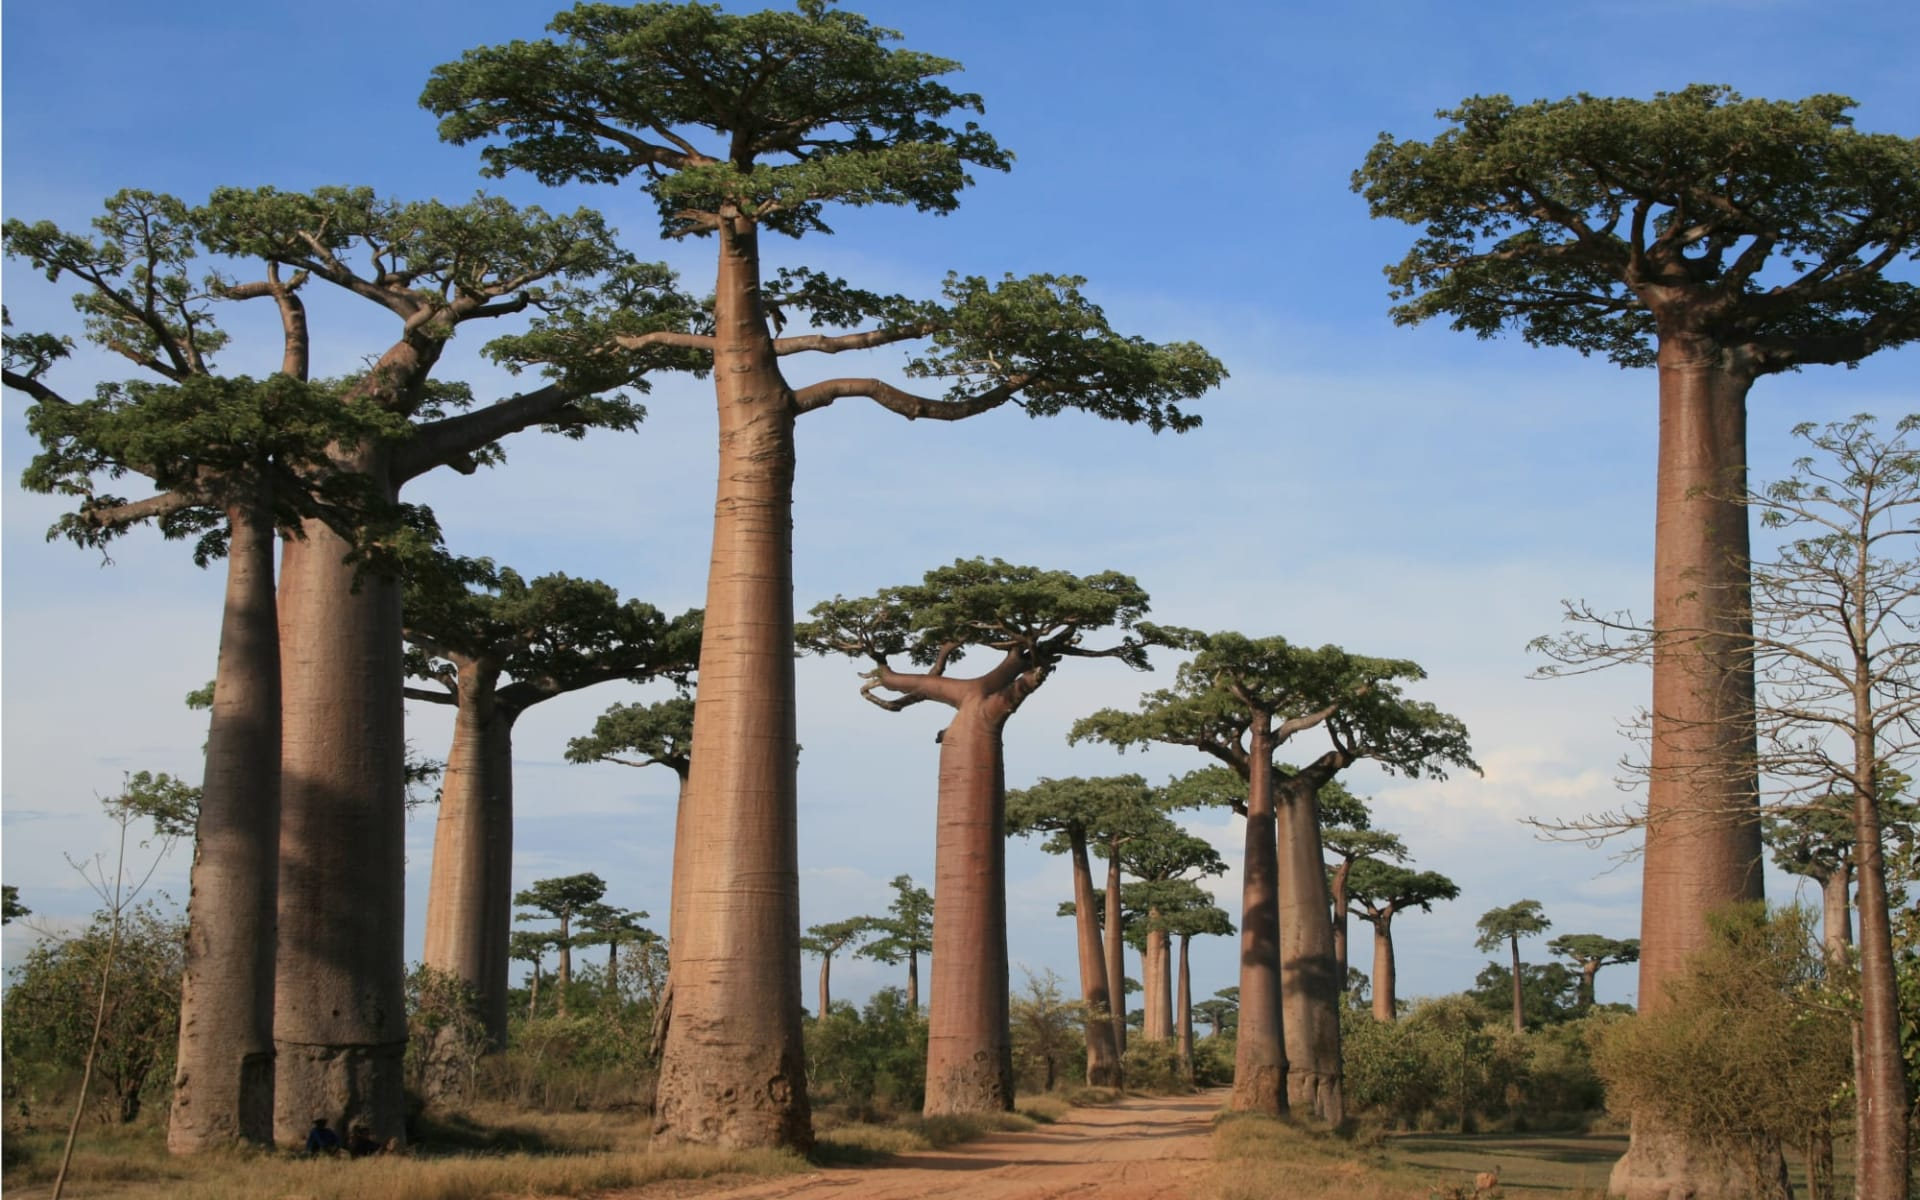 Einzigartiges Madagaskar ab Antananarivo: Baobab trees